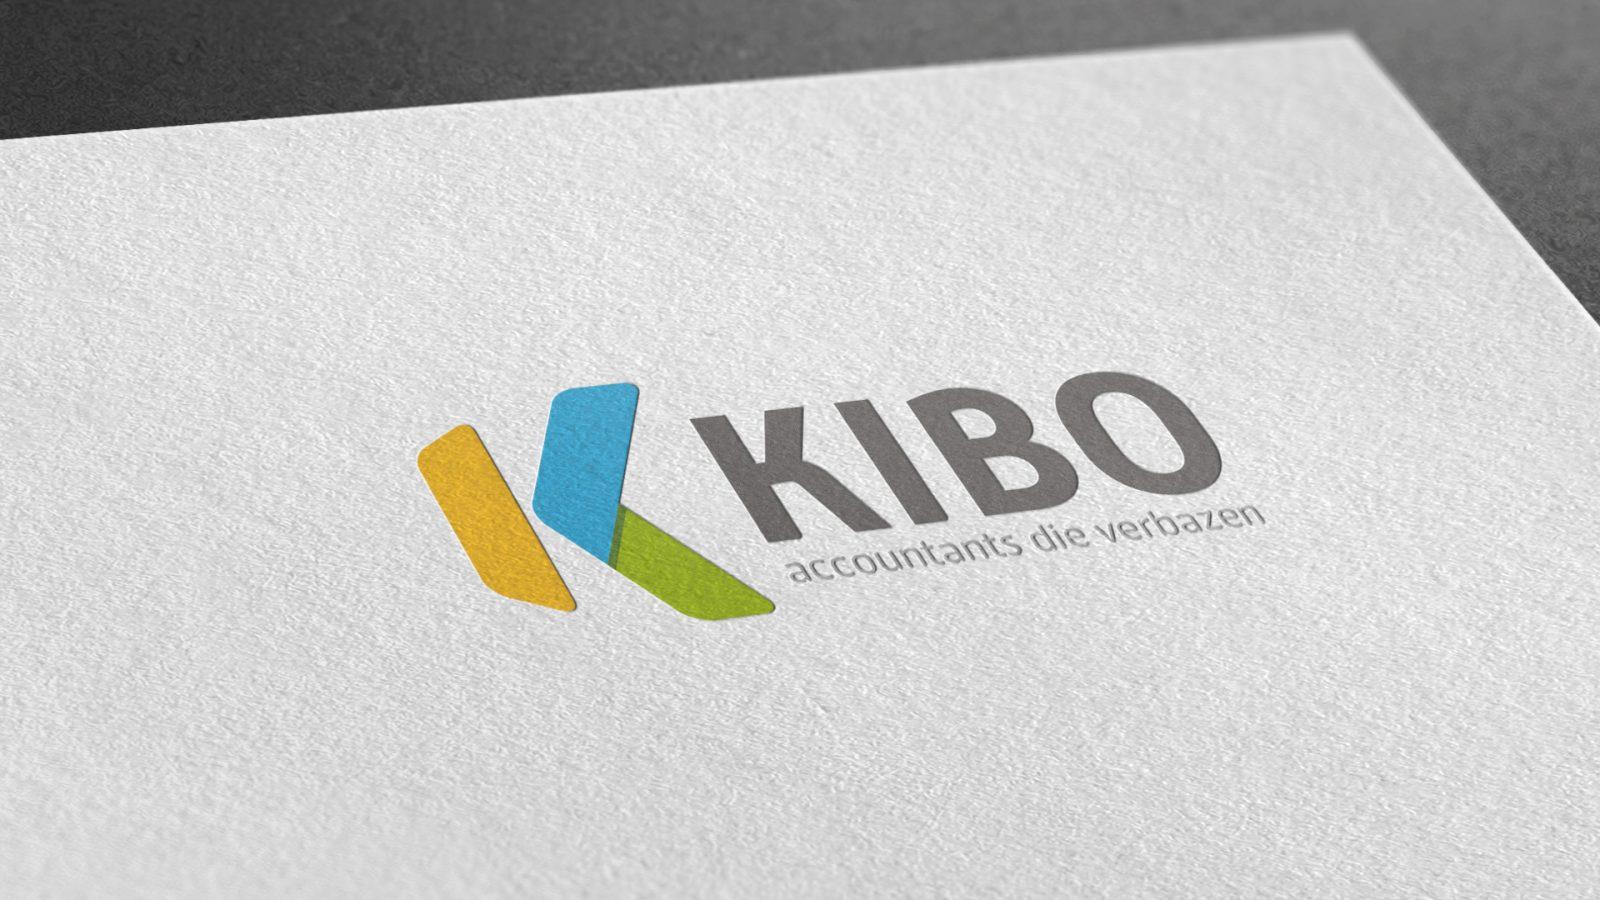 Kibo merkconcept visitekaartje